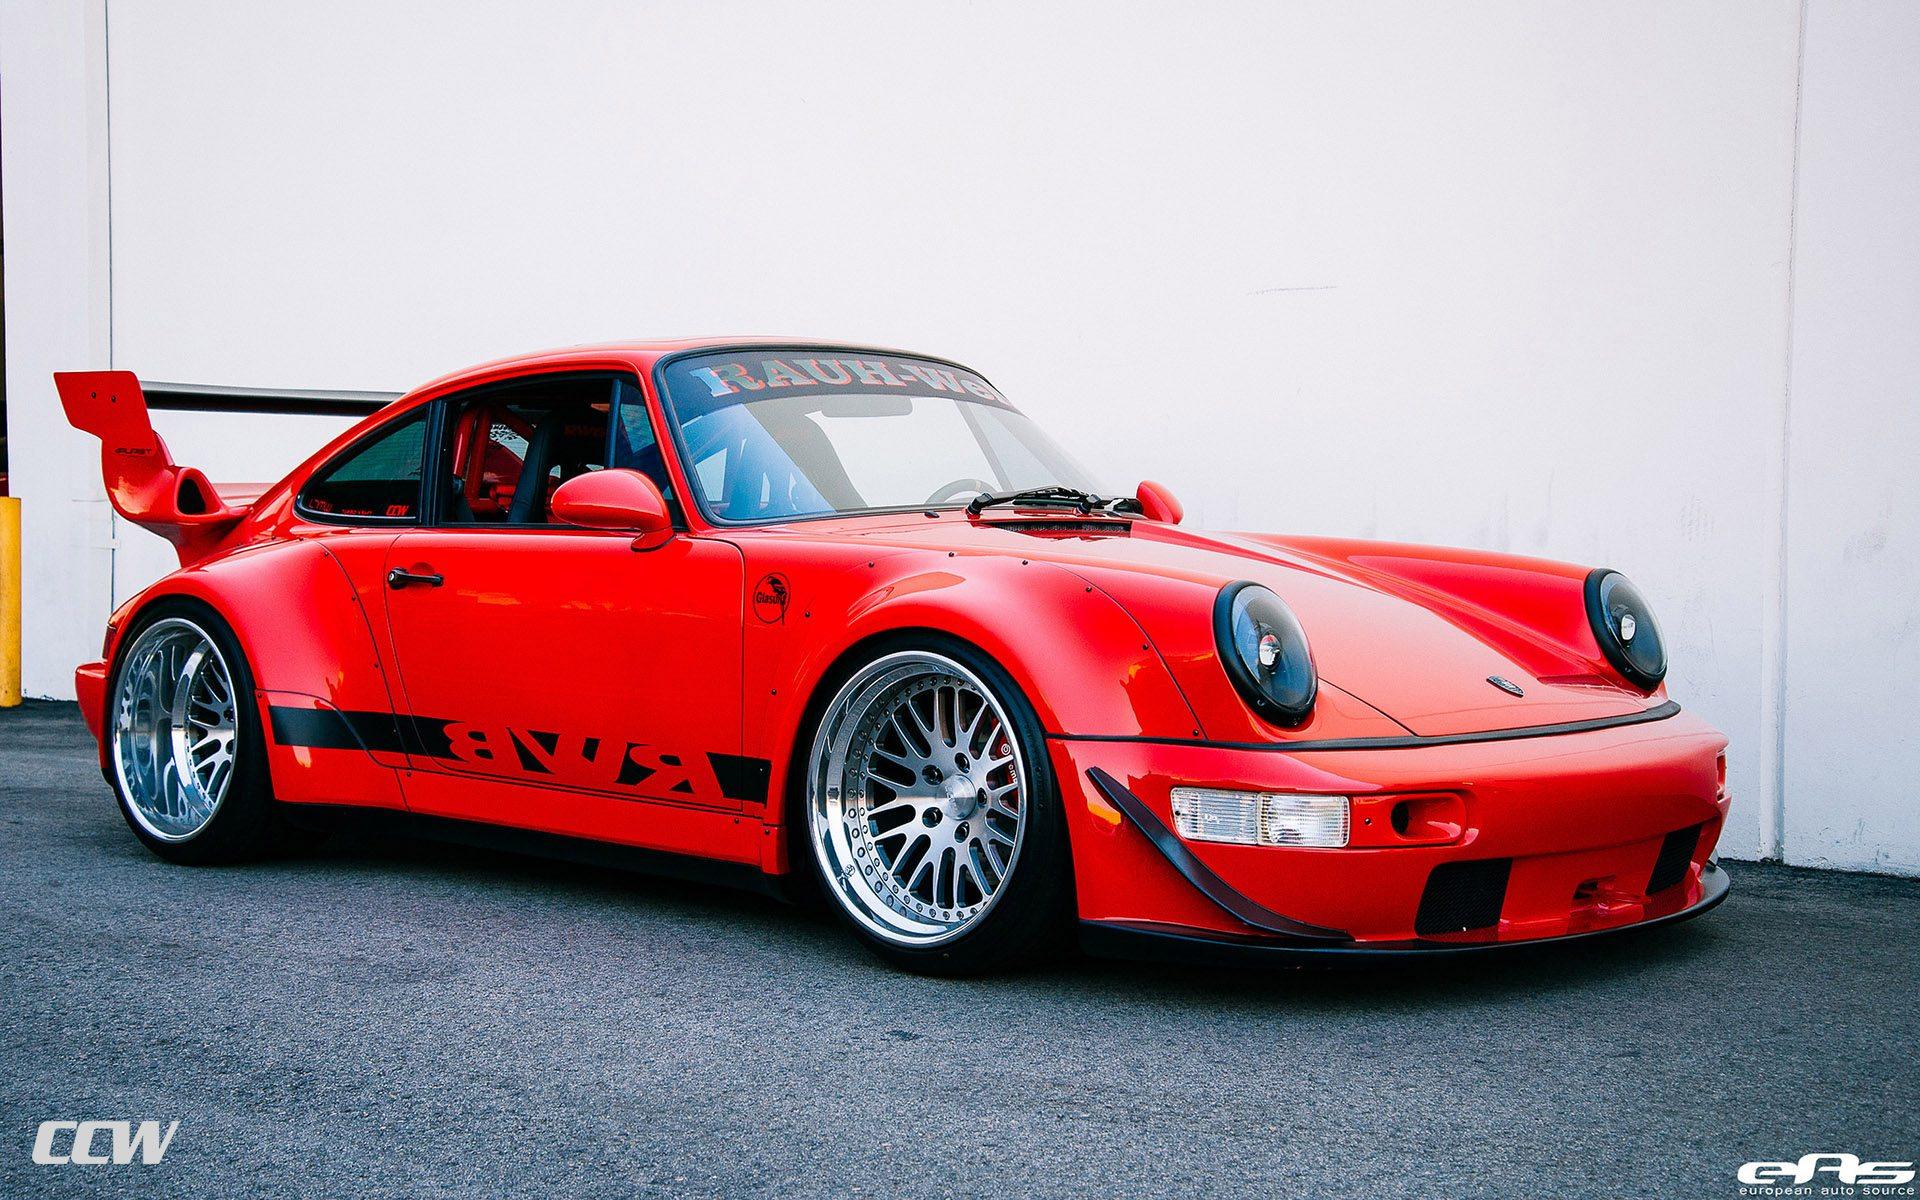 Albania Wallpaper Hd Red Rwb Porsche 964 Turbo Ccw Classic Wheels